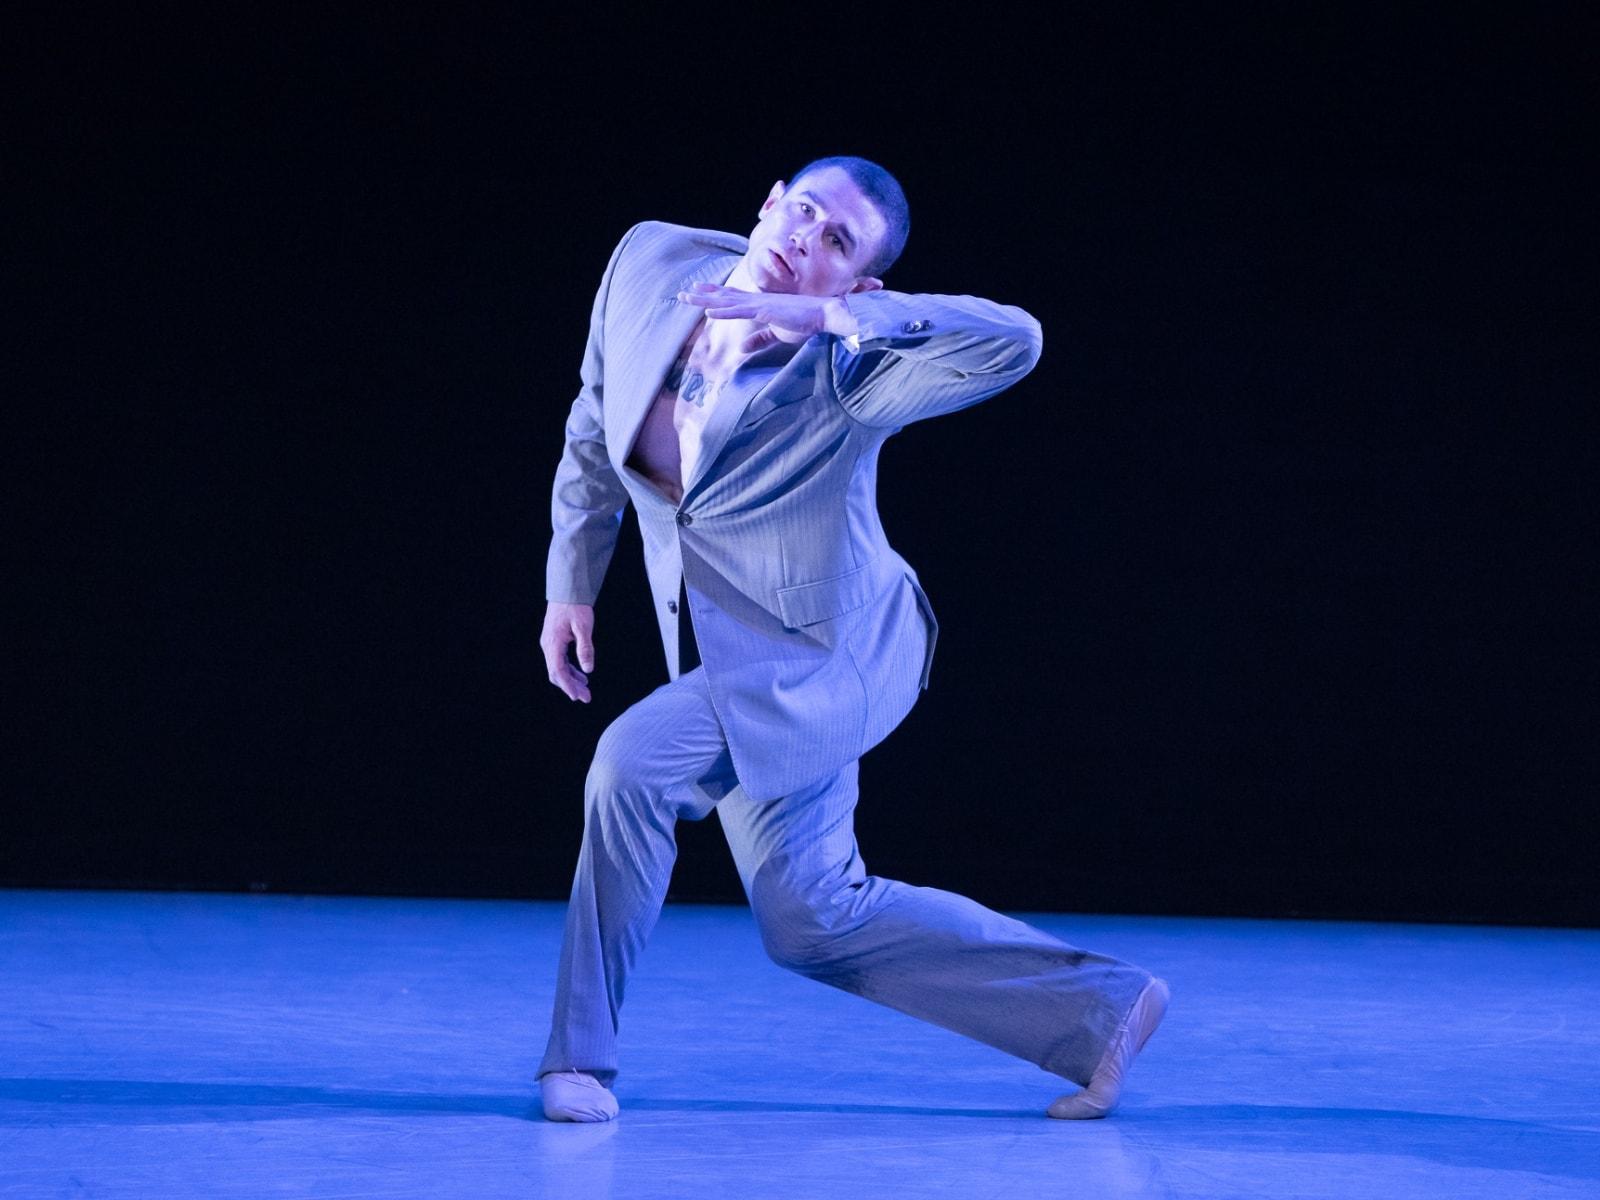 Max dancing in a grey suit.